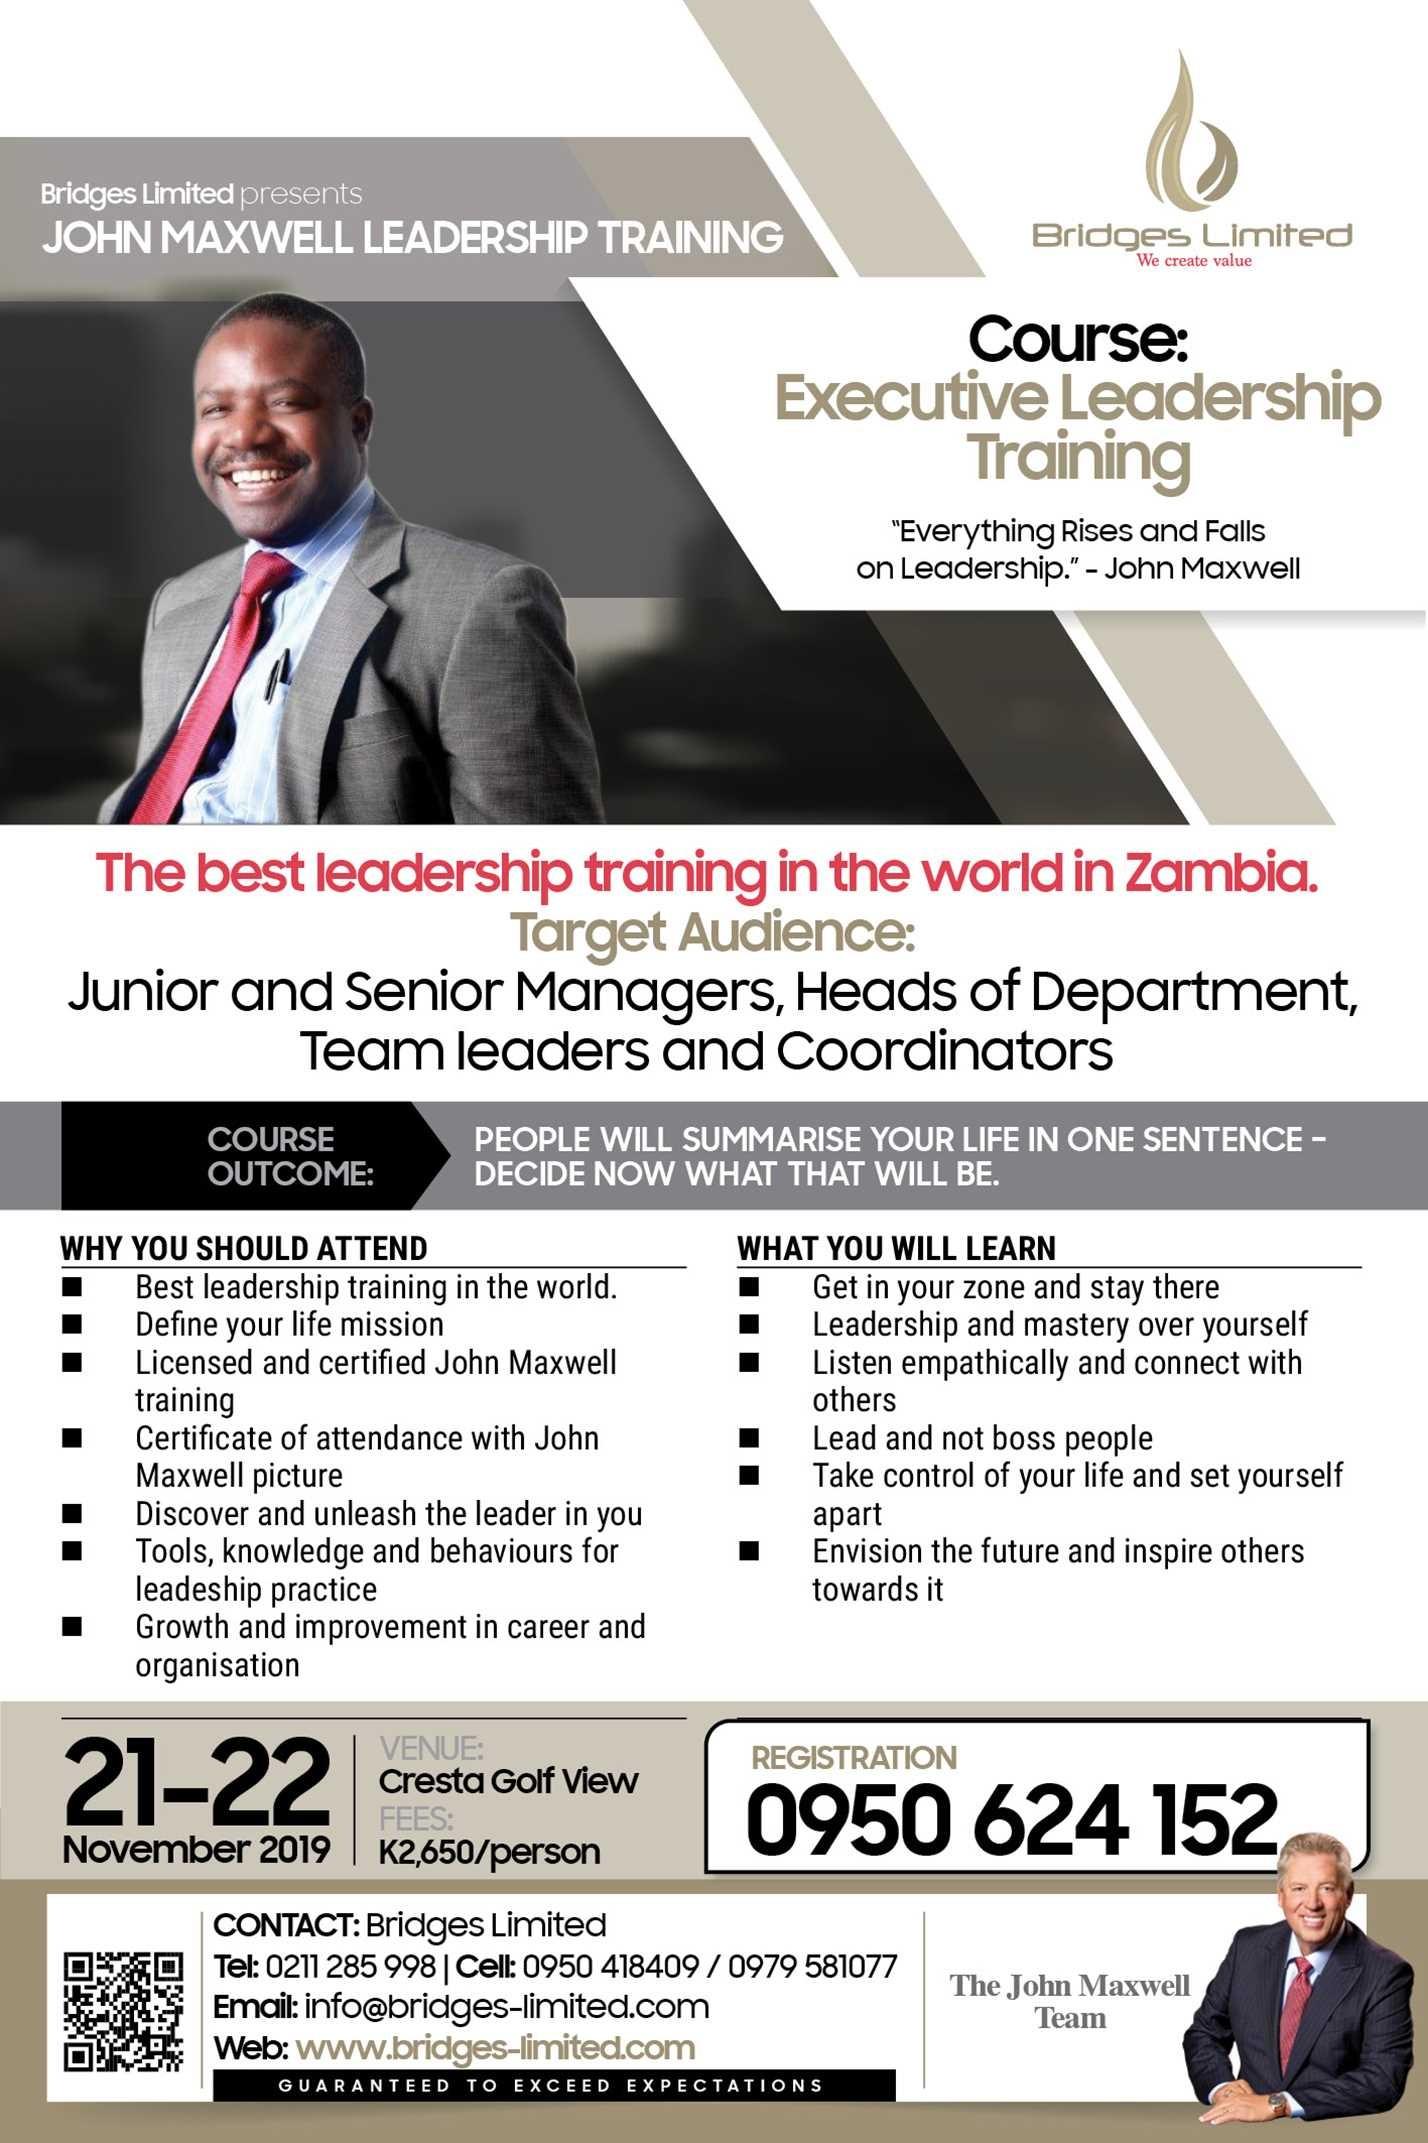 John Maxwell Leadership Training – 20th to 22nd November 2019